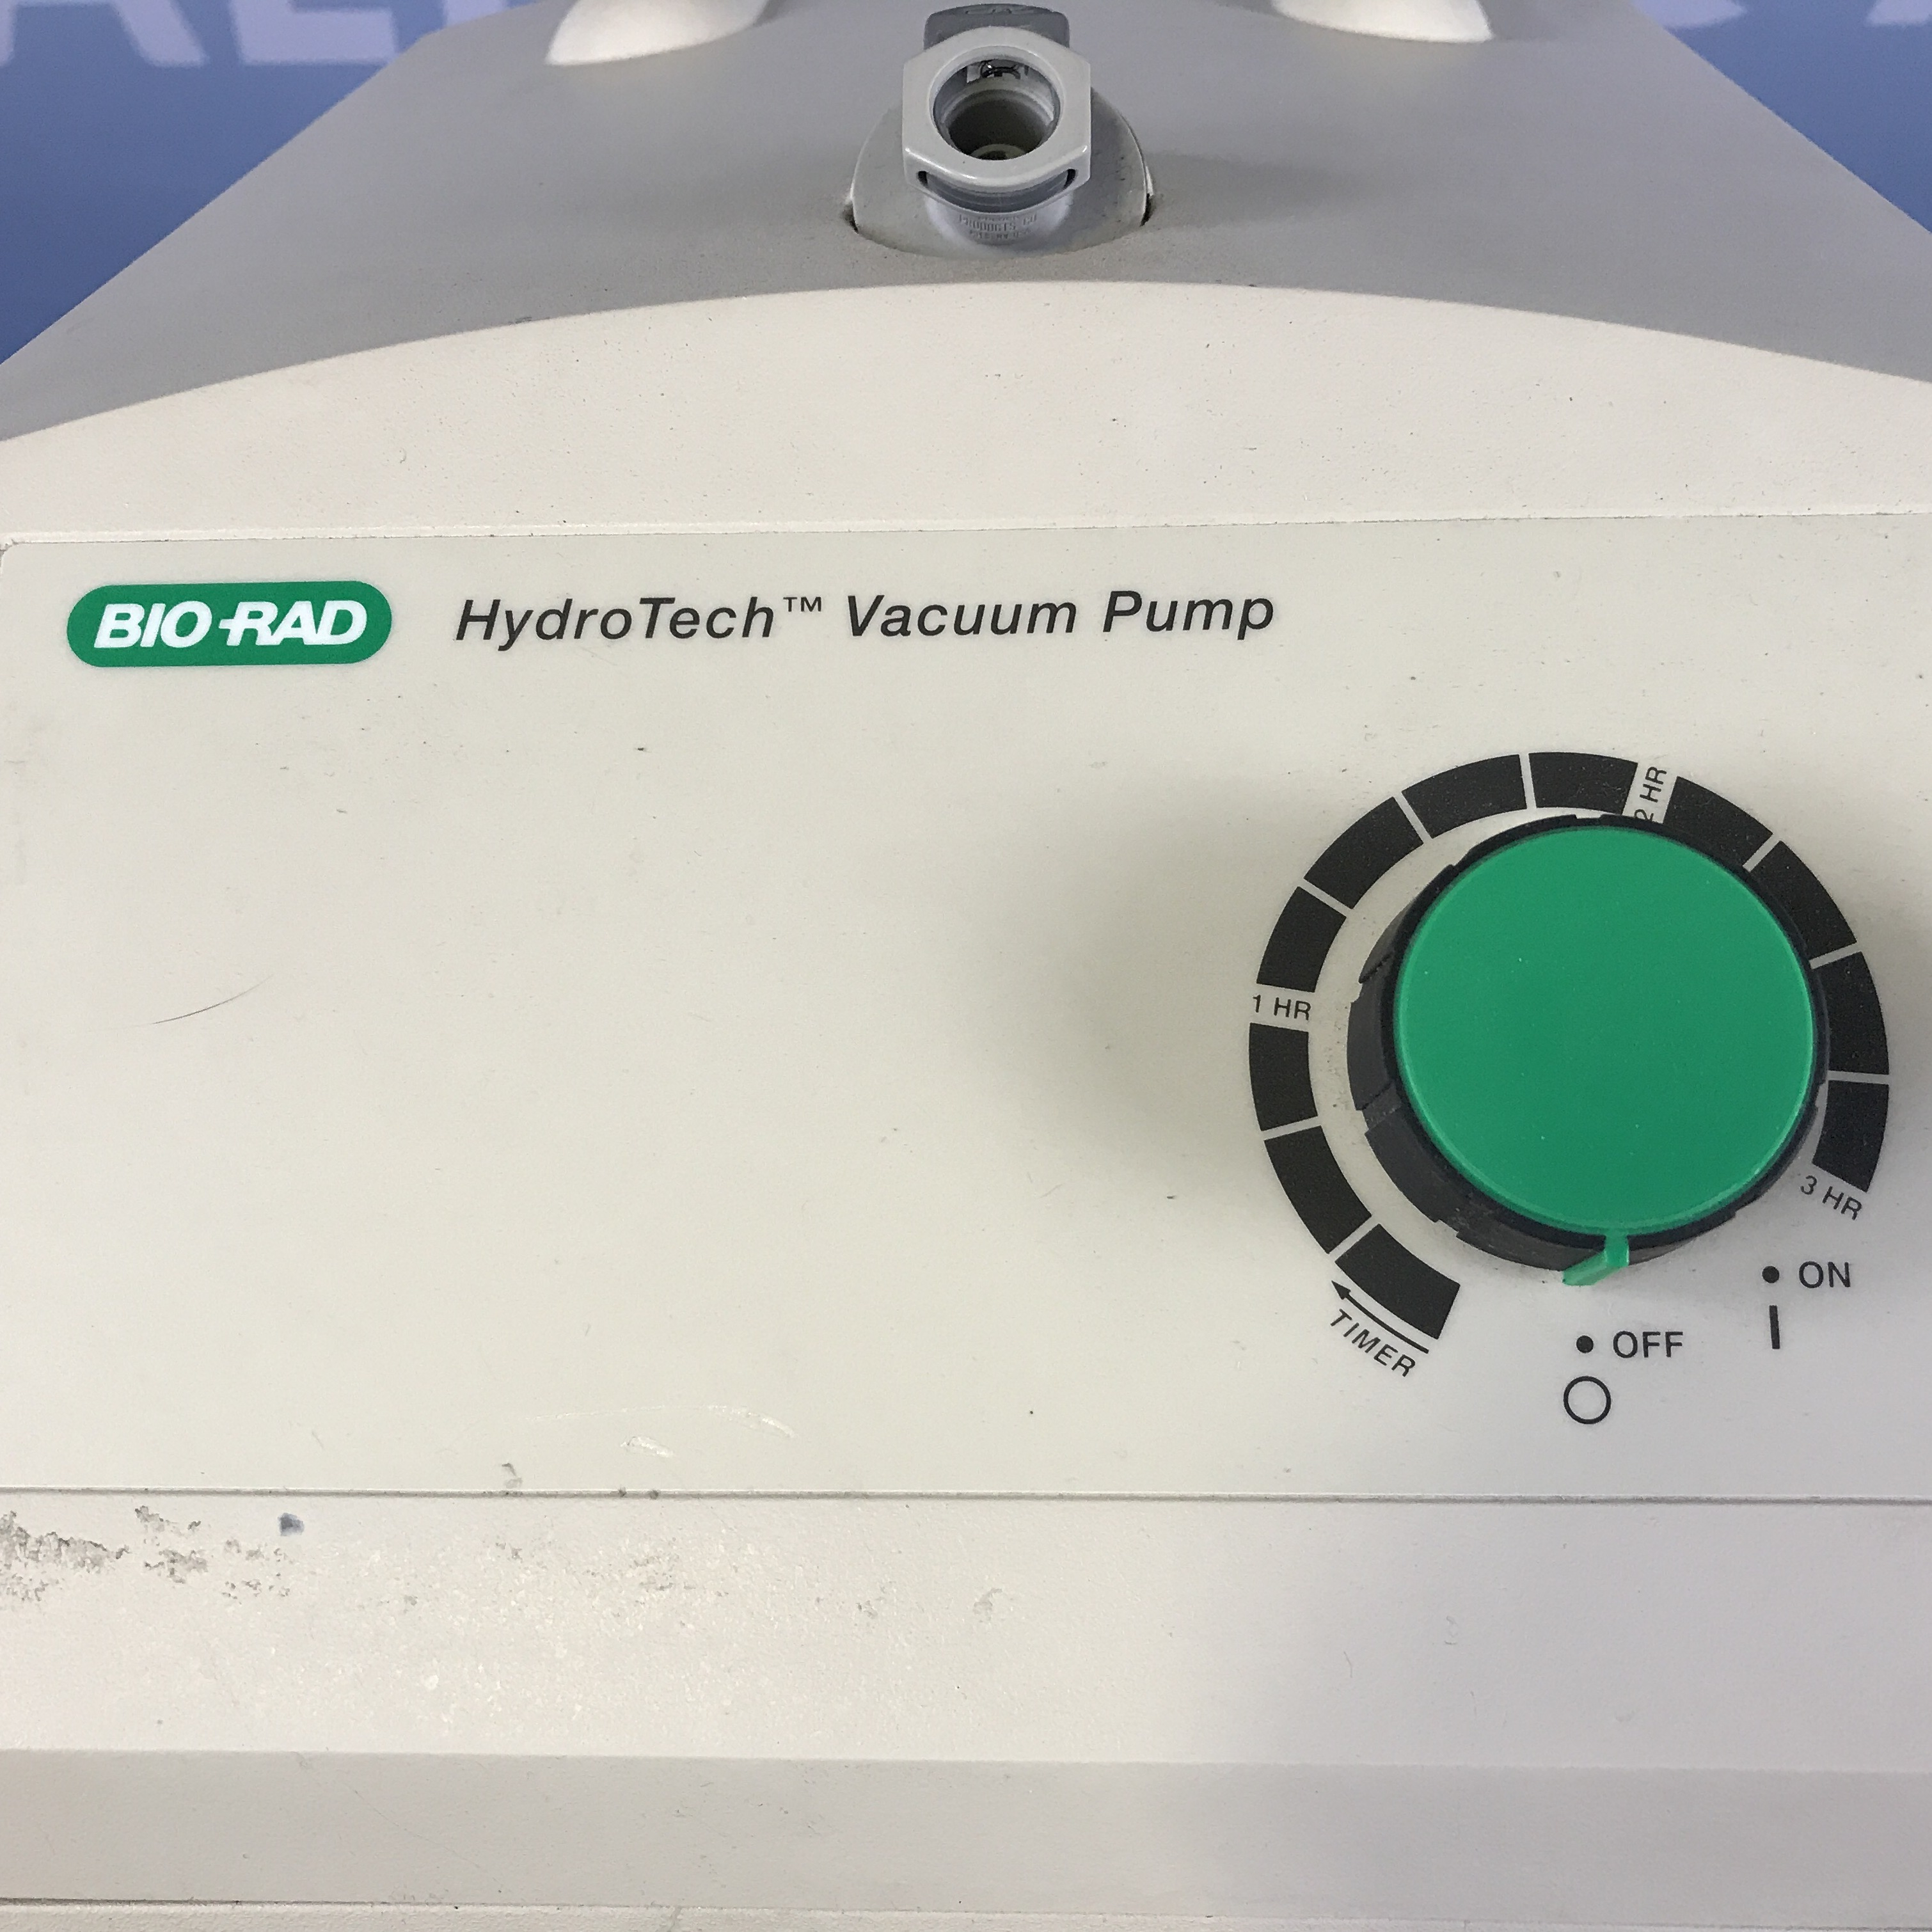 Bio-Rad HydroTech Vacuum Pump Image